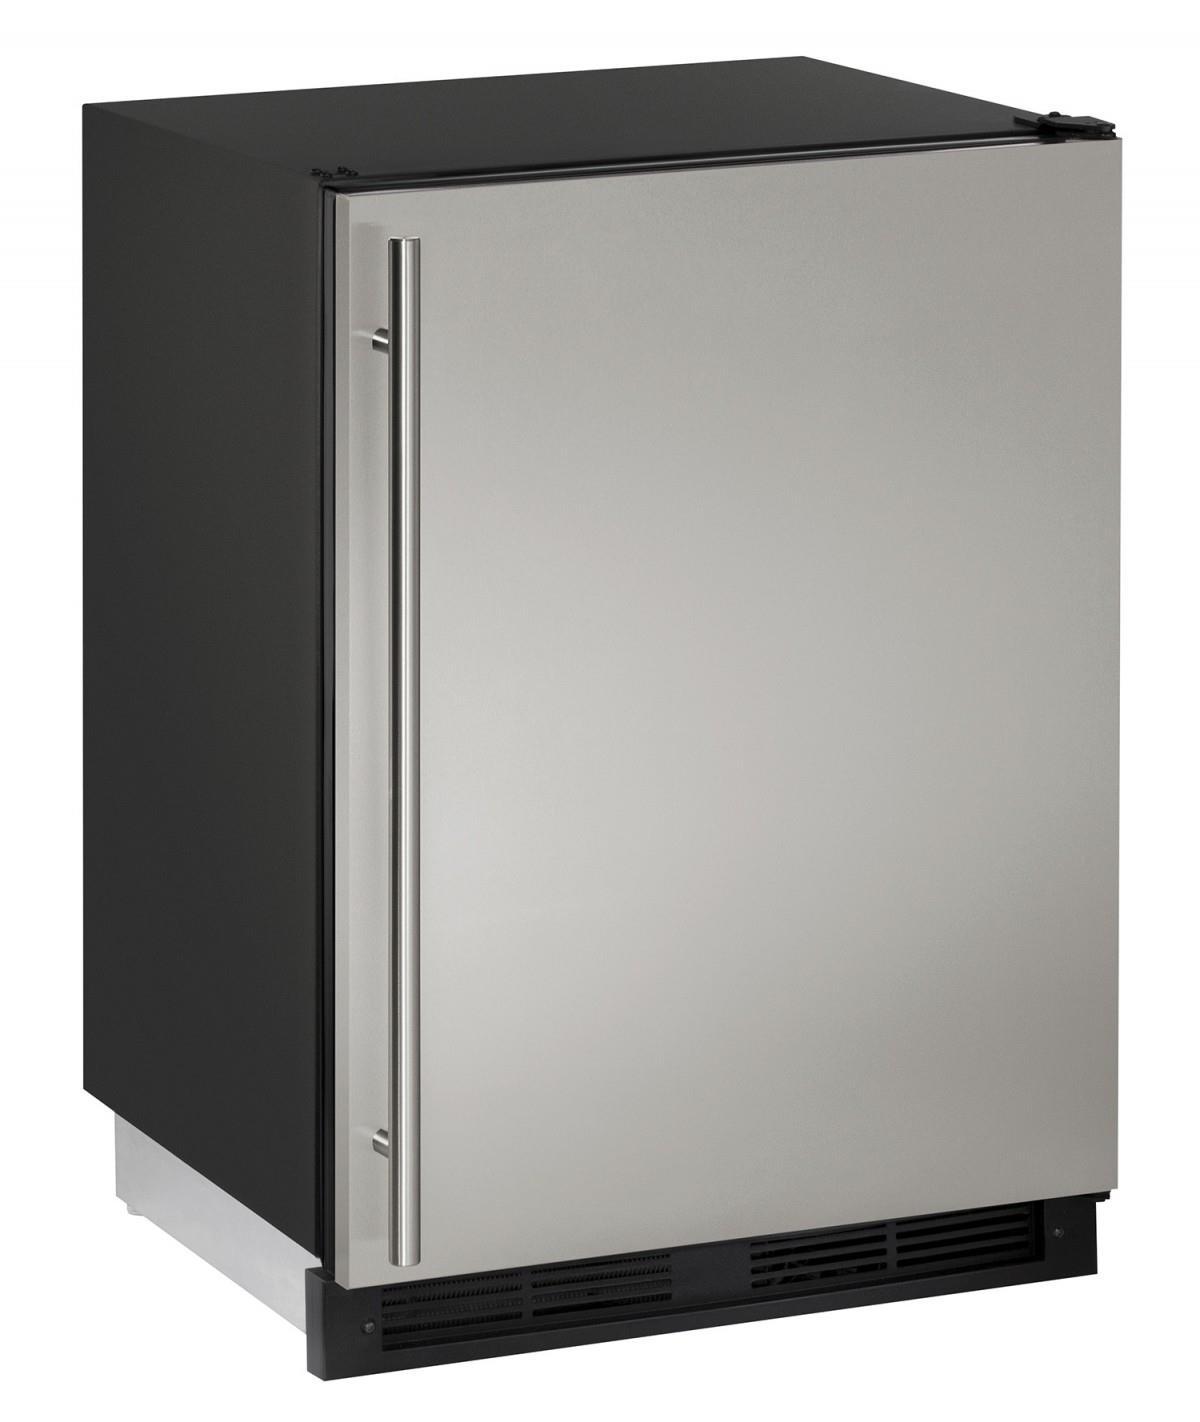 U-Line Refrigerators 4.2 cu. ft. Built-in Refrigerator/Freezer - Item Number: U-CO1224FS-00A